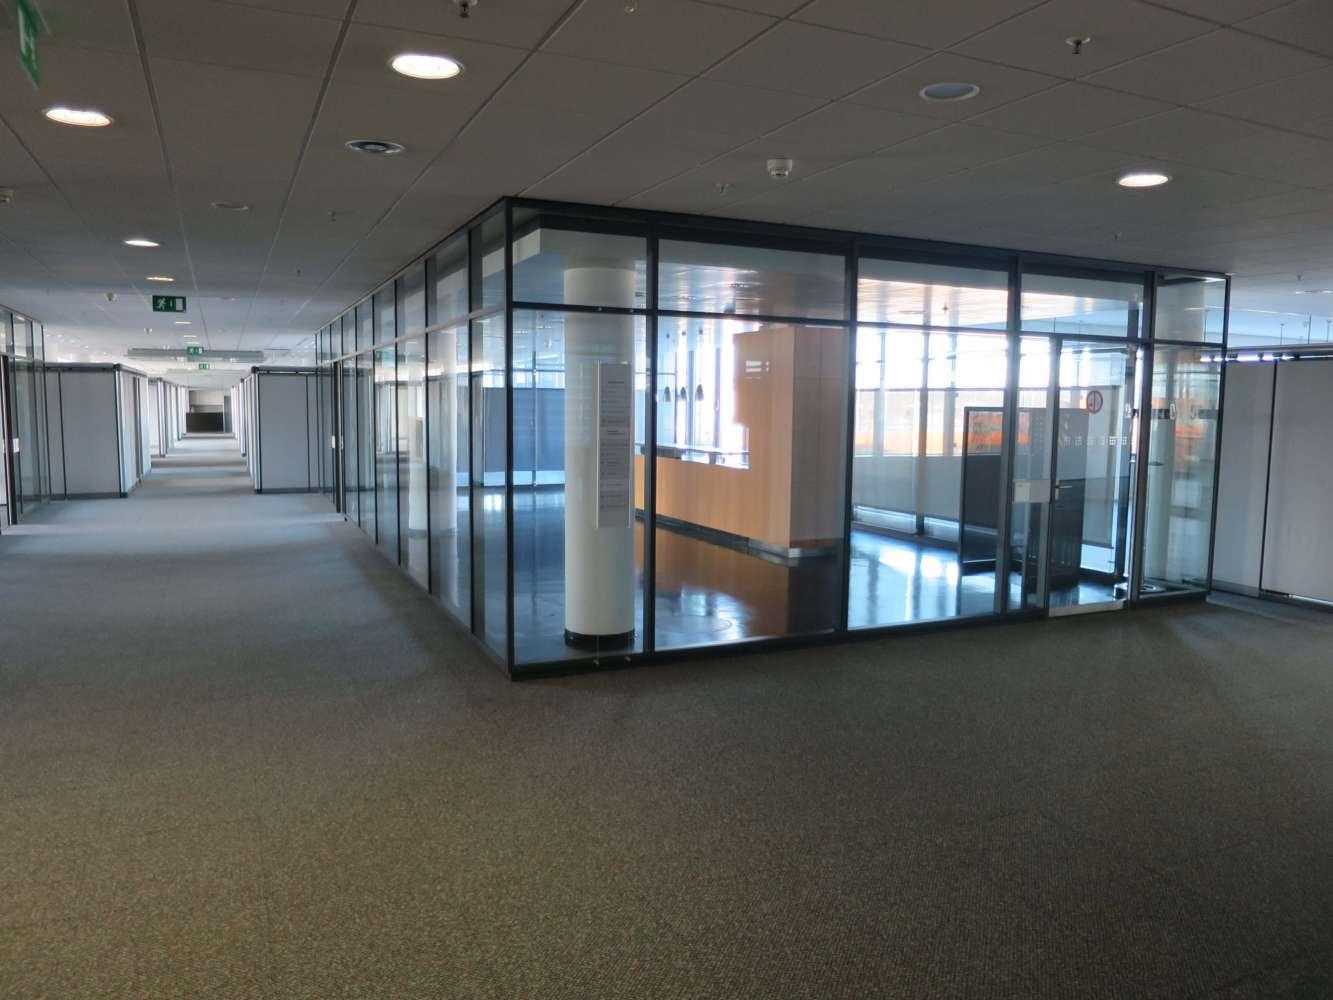 Büros Frankfurt am main, 60386 - Büro - Frankfurt am Main, Fechenheim - F2401 - 9534738